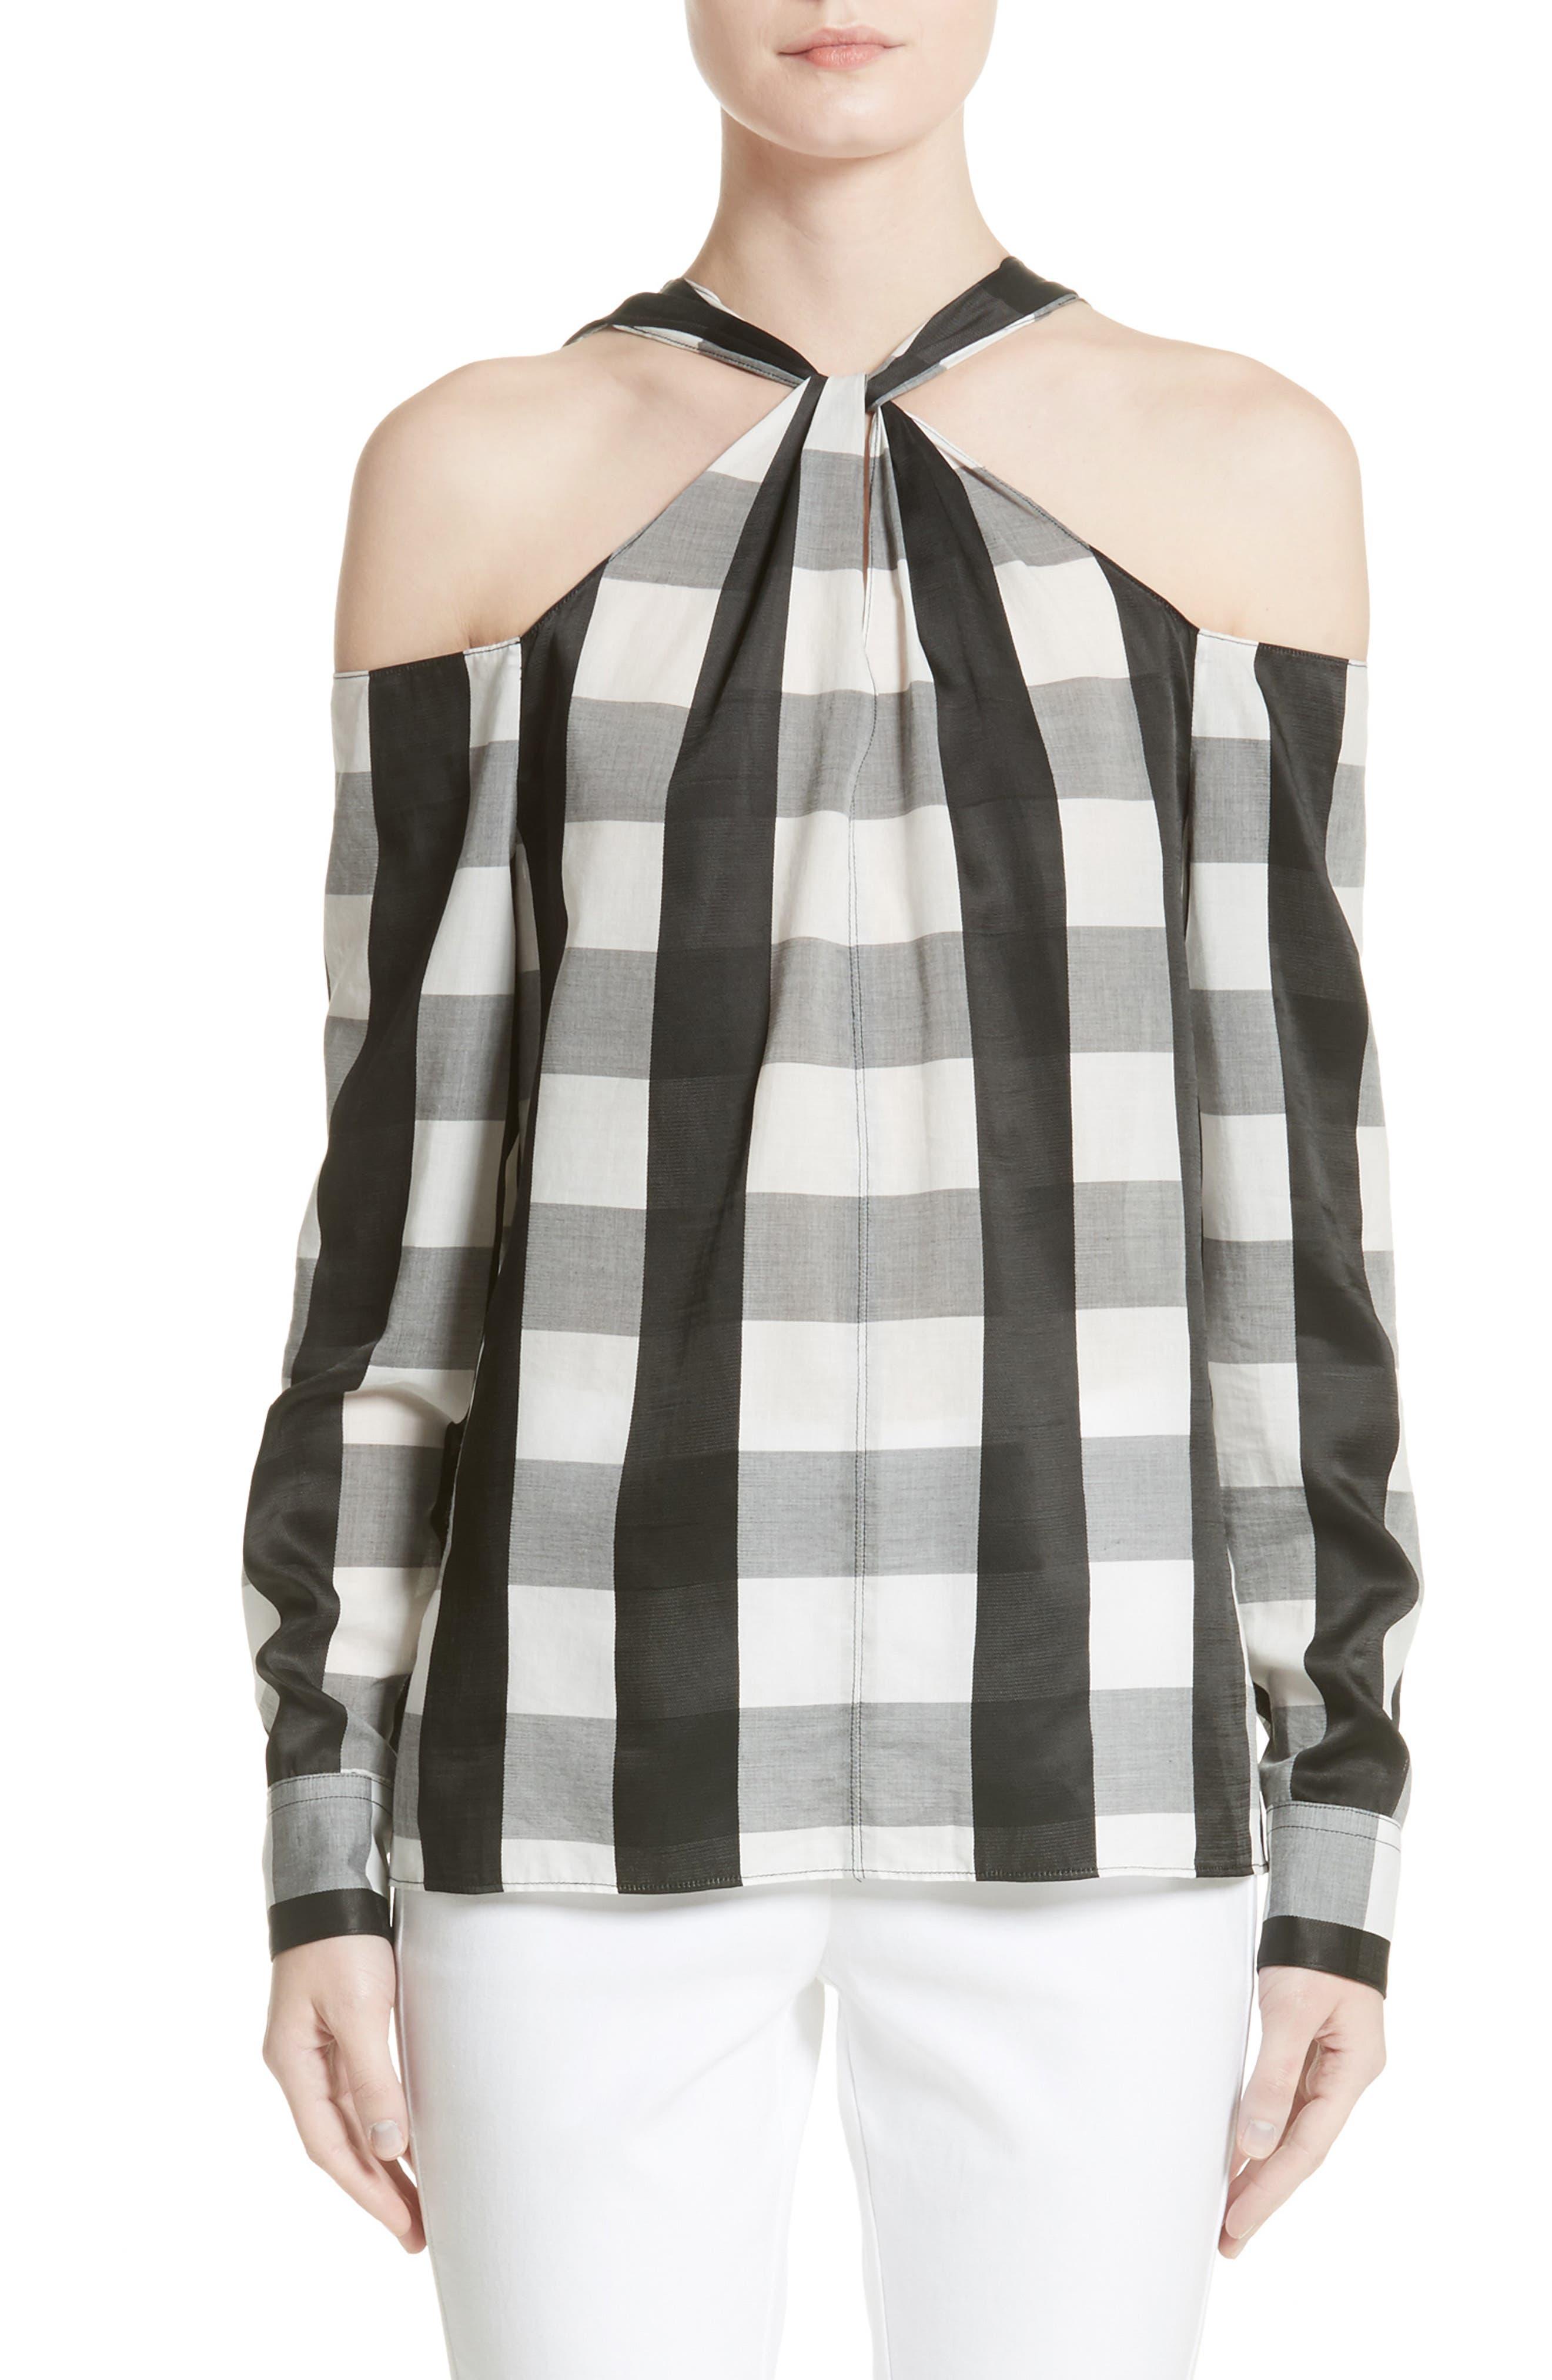 Collingwood Cold Shoulder Top,                         Main,                         color, Black/ White